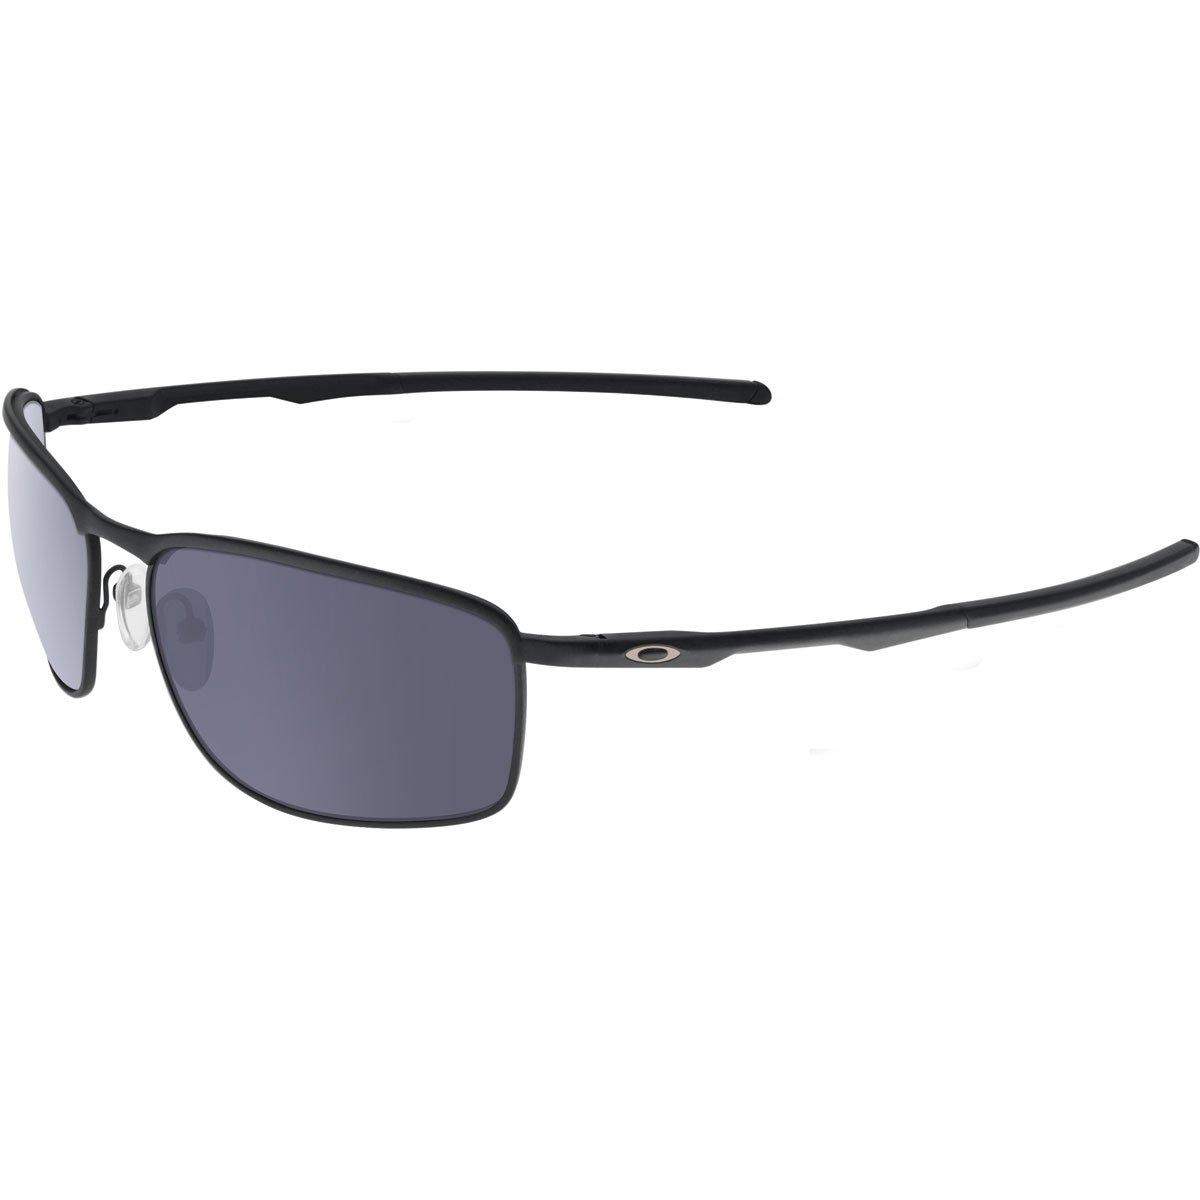 Oakley Men's Conductor 8 0OO4107 Rectangular Sunglasses, MATTE BLACK, 60 mm